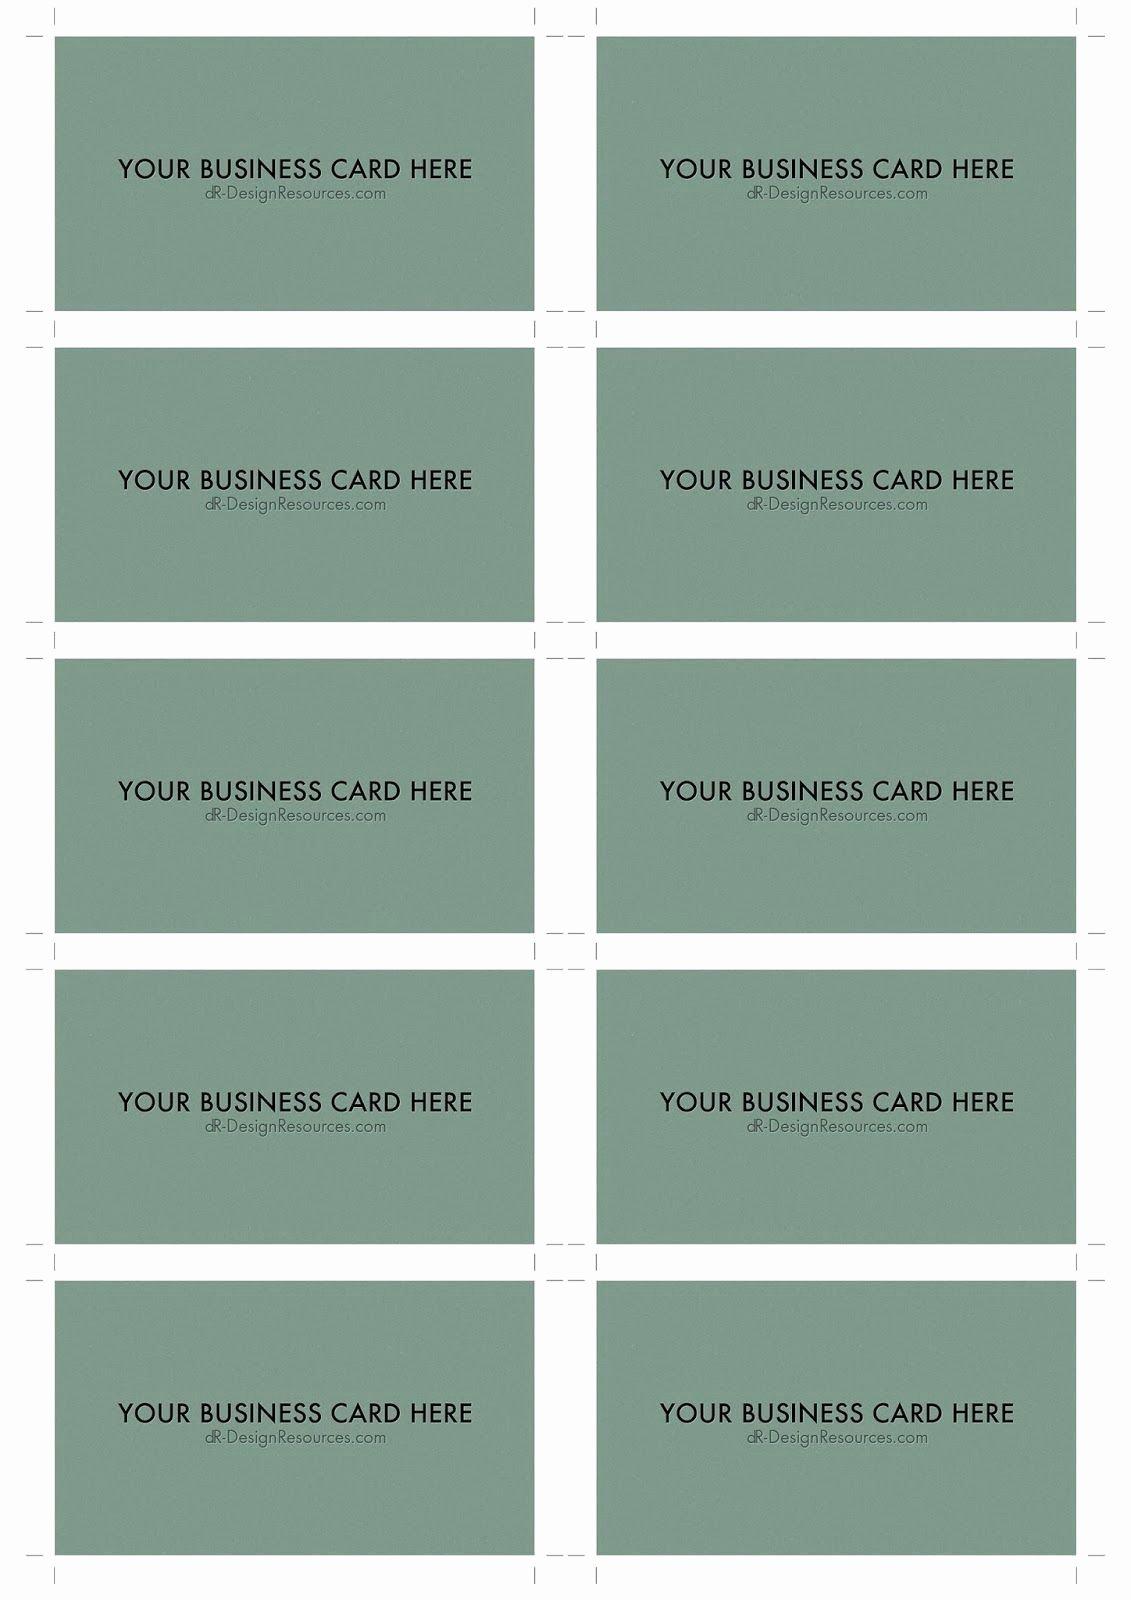 Business Card Sheet Template Unique 10 Business Card Template – Free Sample Business Card